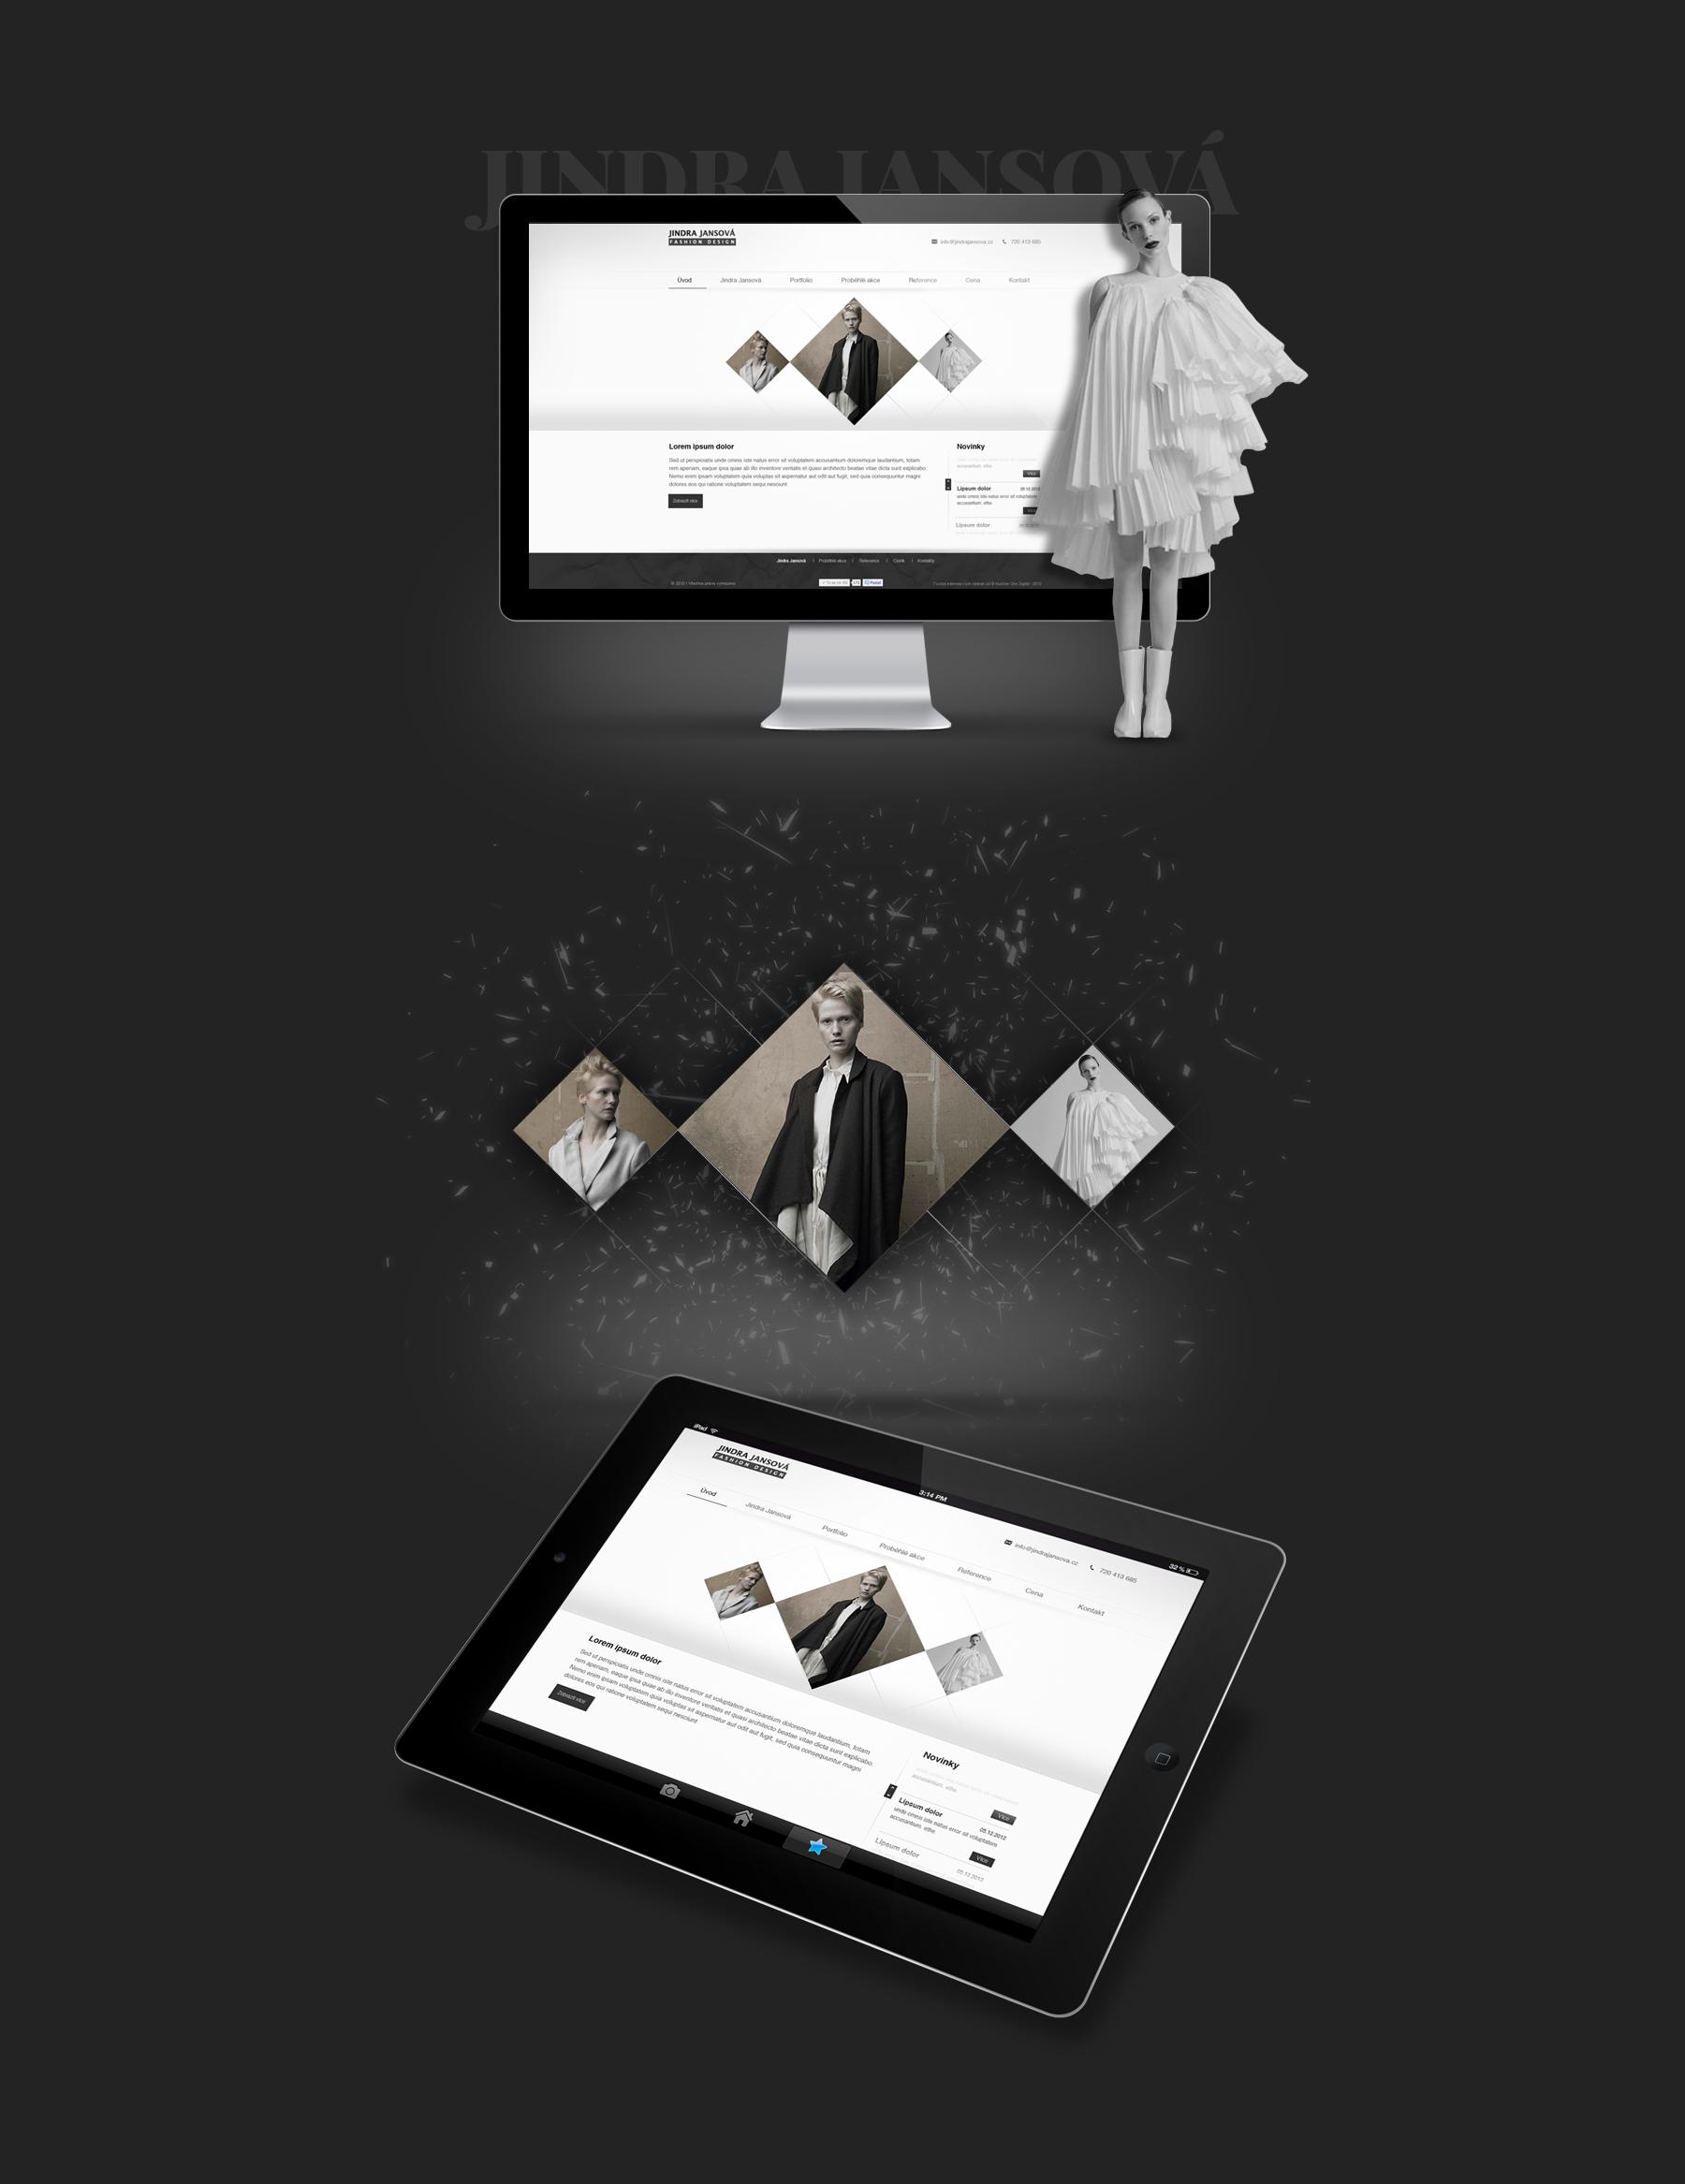 Fashion designer Jansova by Visual-Creative